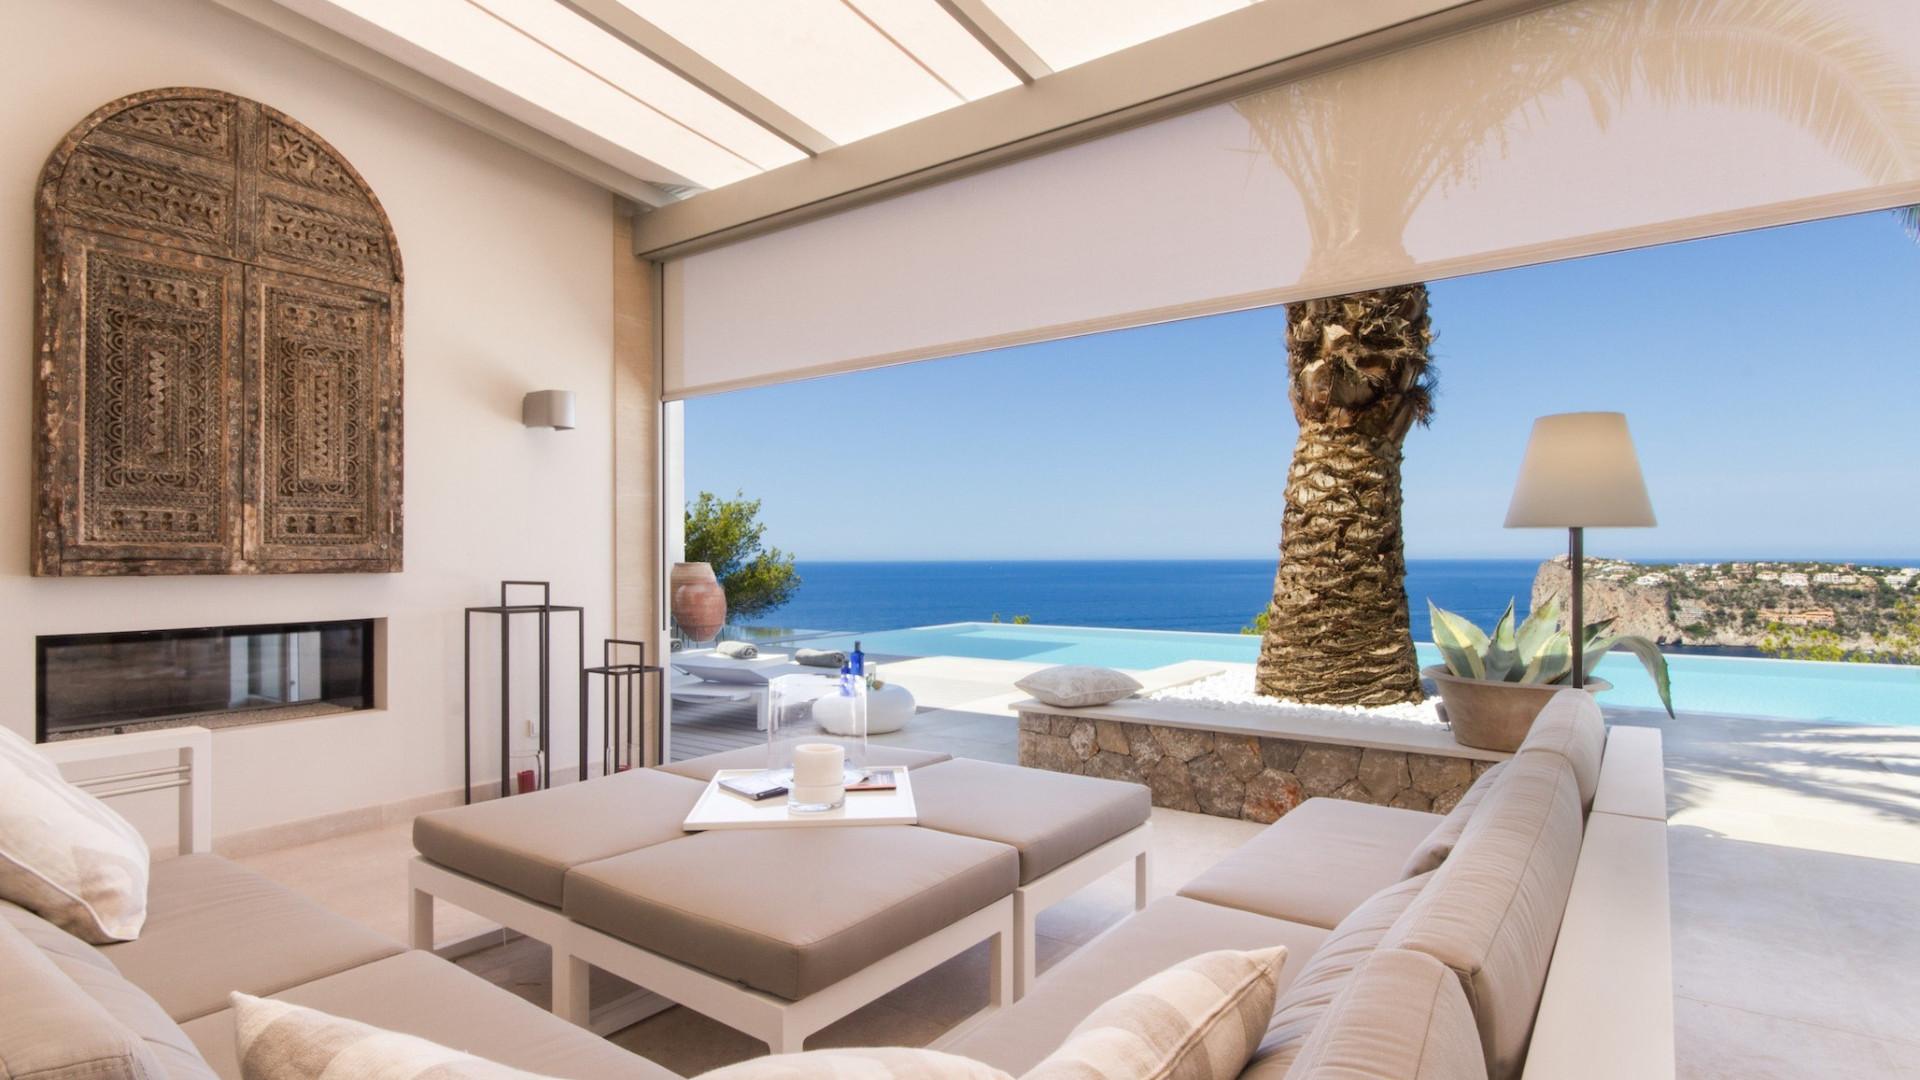 6 Bedroom Villa Andratx Stunning Sea Views & Swimming Pool